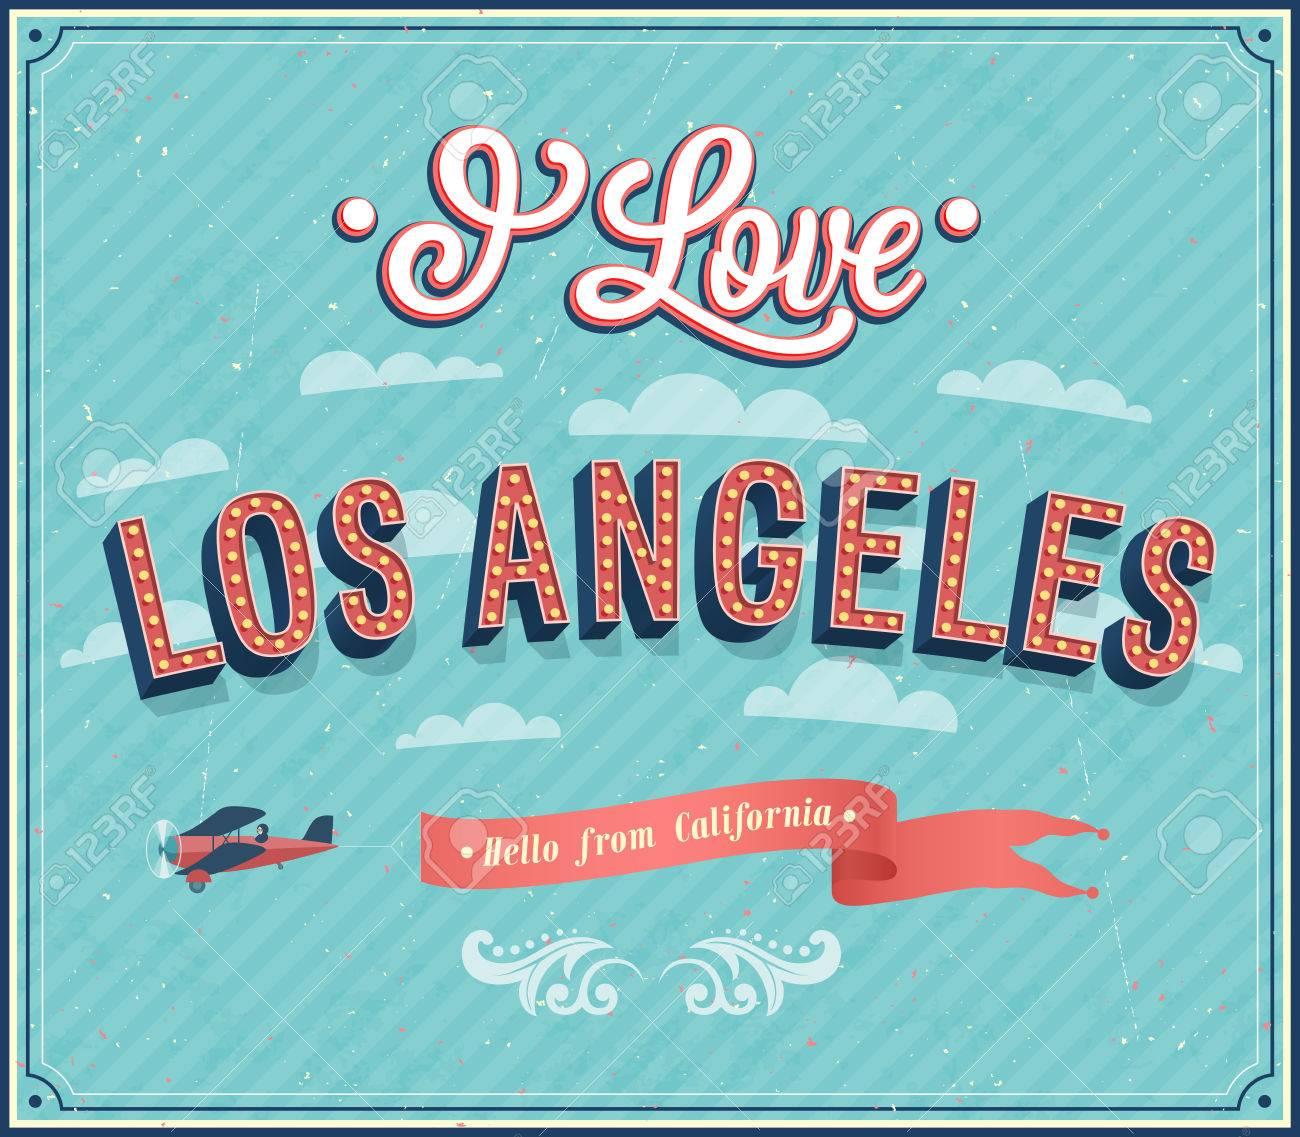 Vintage Greeting Card From Los Angeles California Vector - Los angeles posters vintage